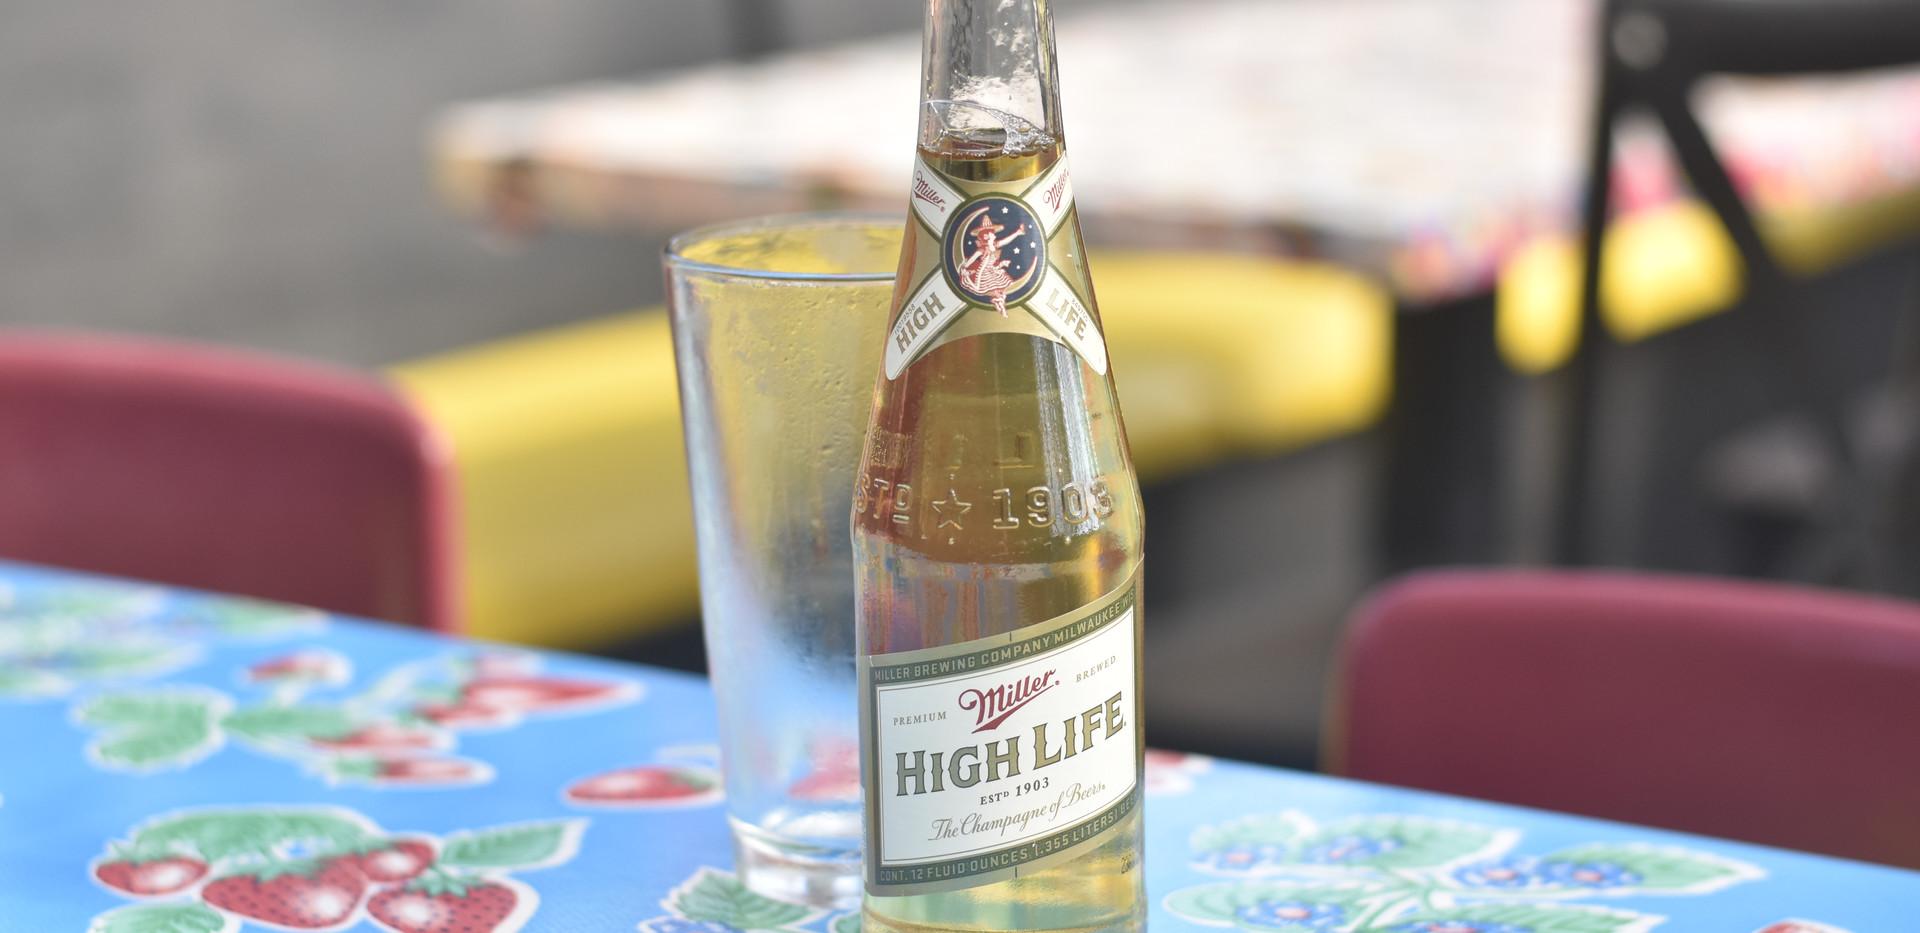 50c High Life